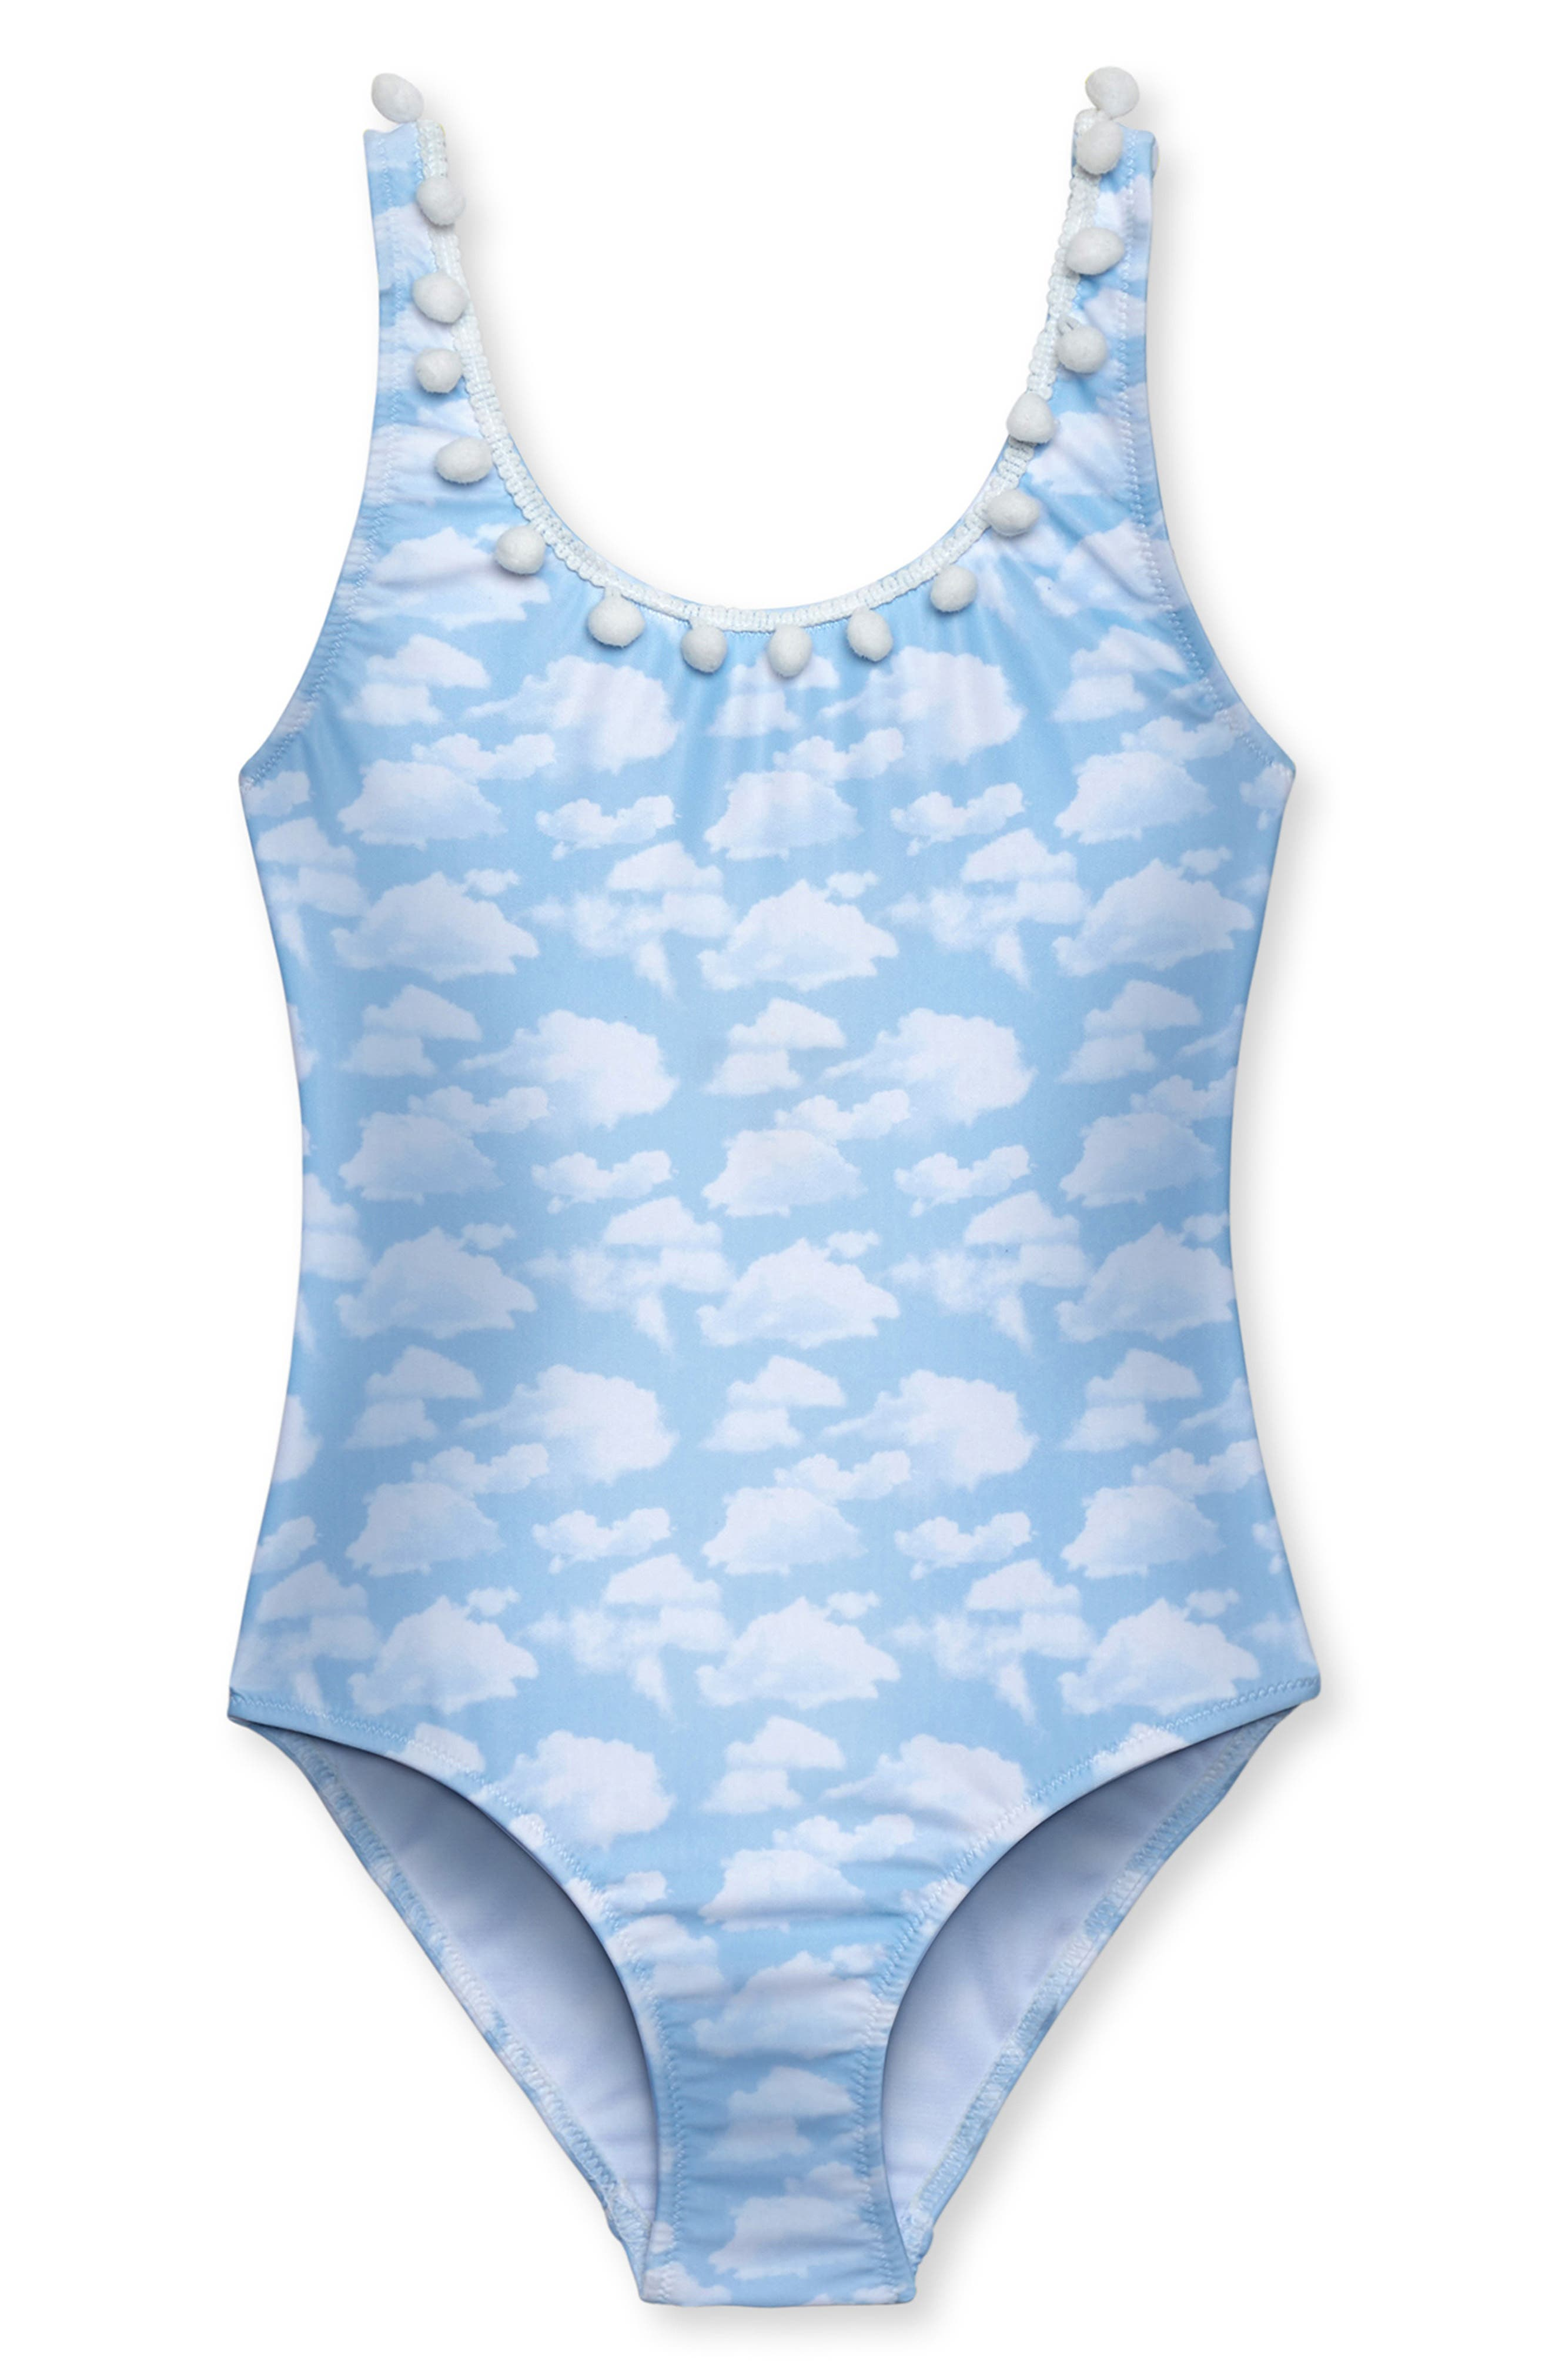 STELLA COVE, Beautiful Sky Print One-Piece Swimsuit, Main thumbnail 1, color, BLUE